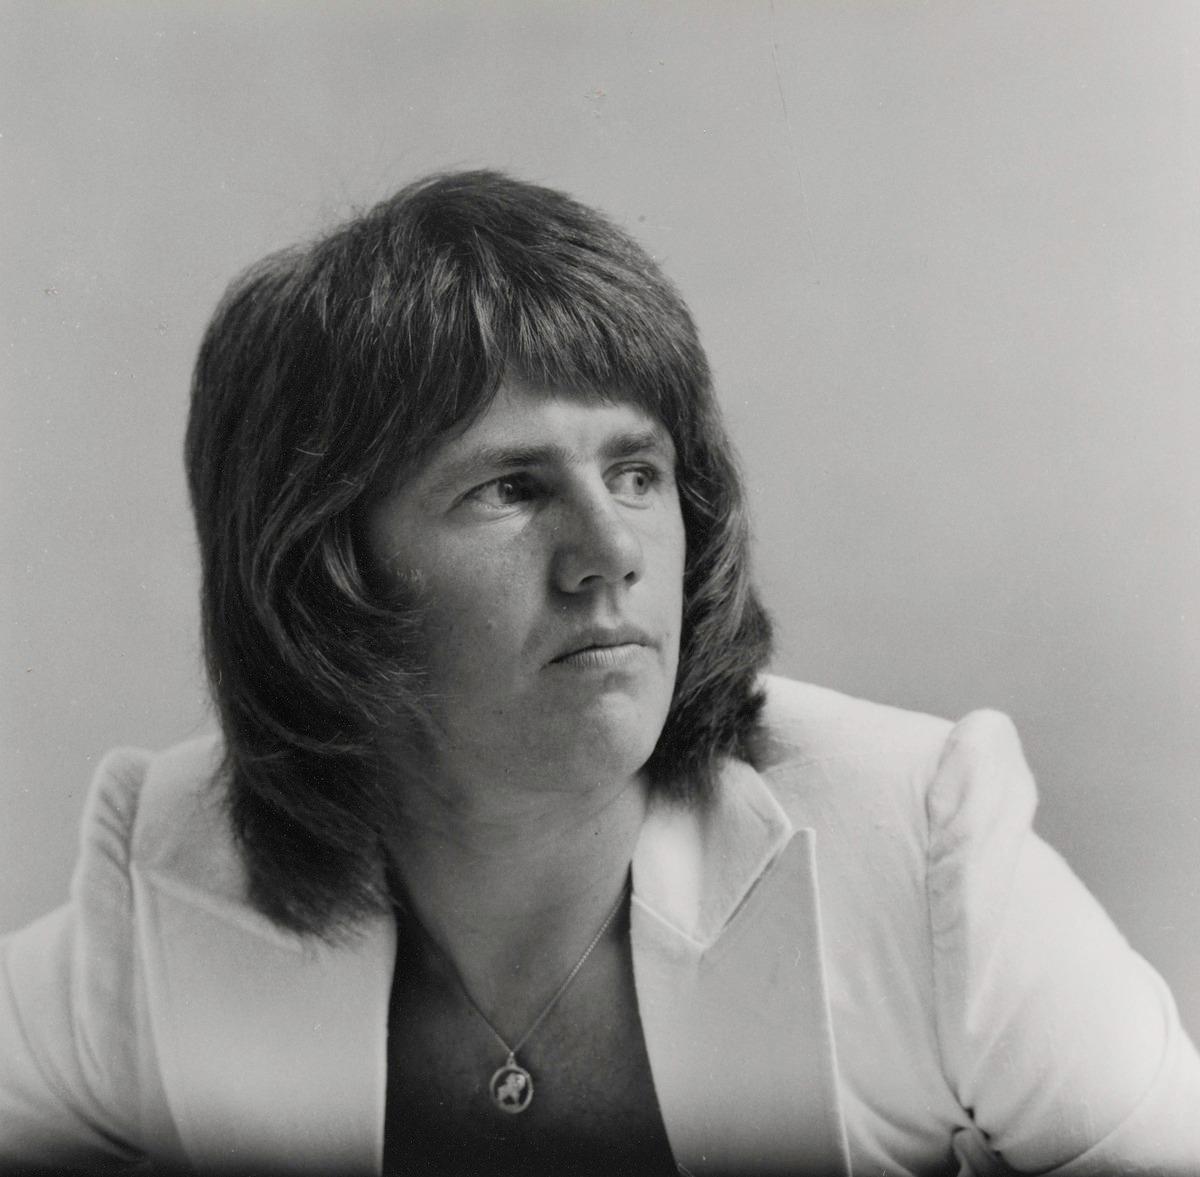 Daryl Braithwaite National Portrait Gallery